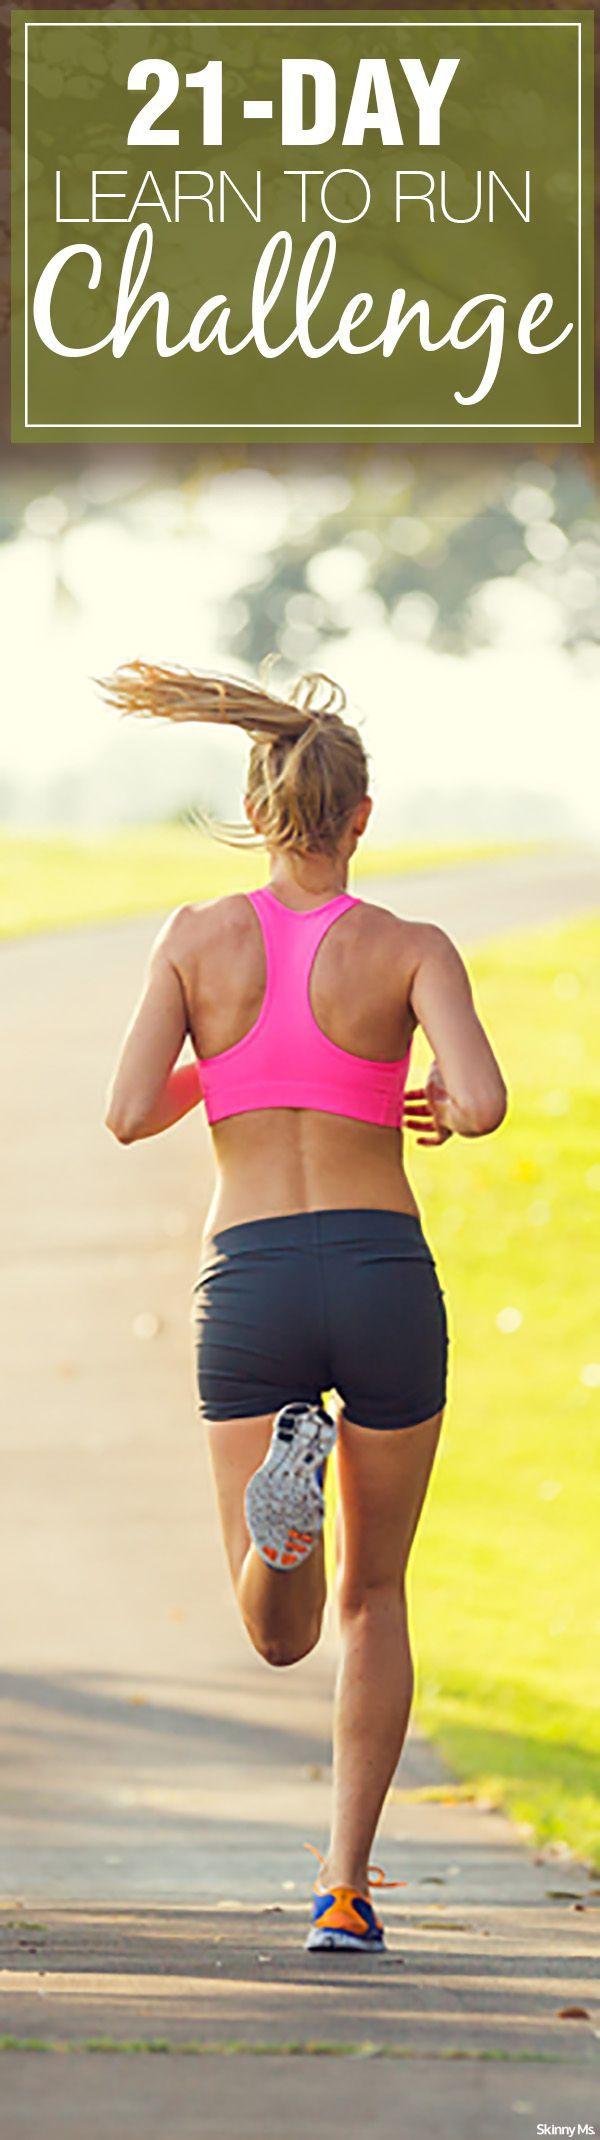 21-Day Learn to Run Challenge #runningchallenge #running